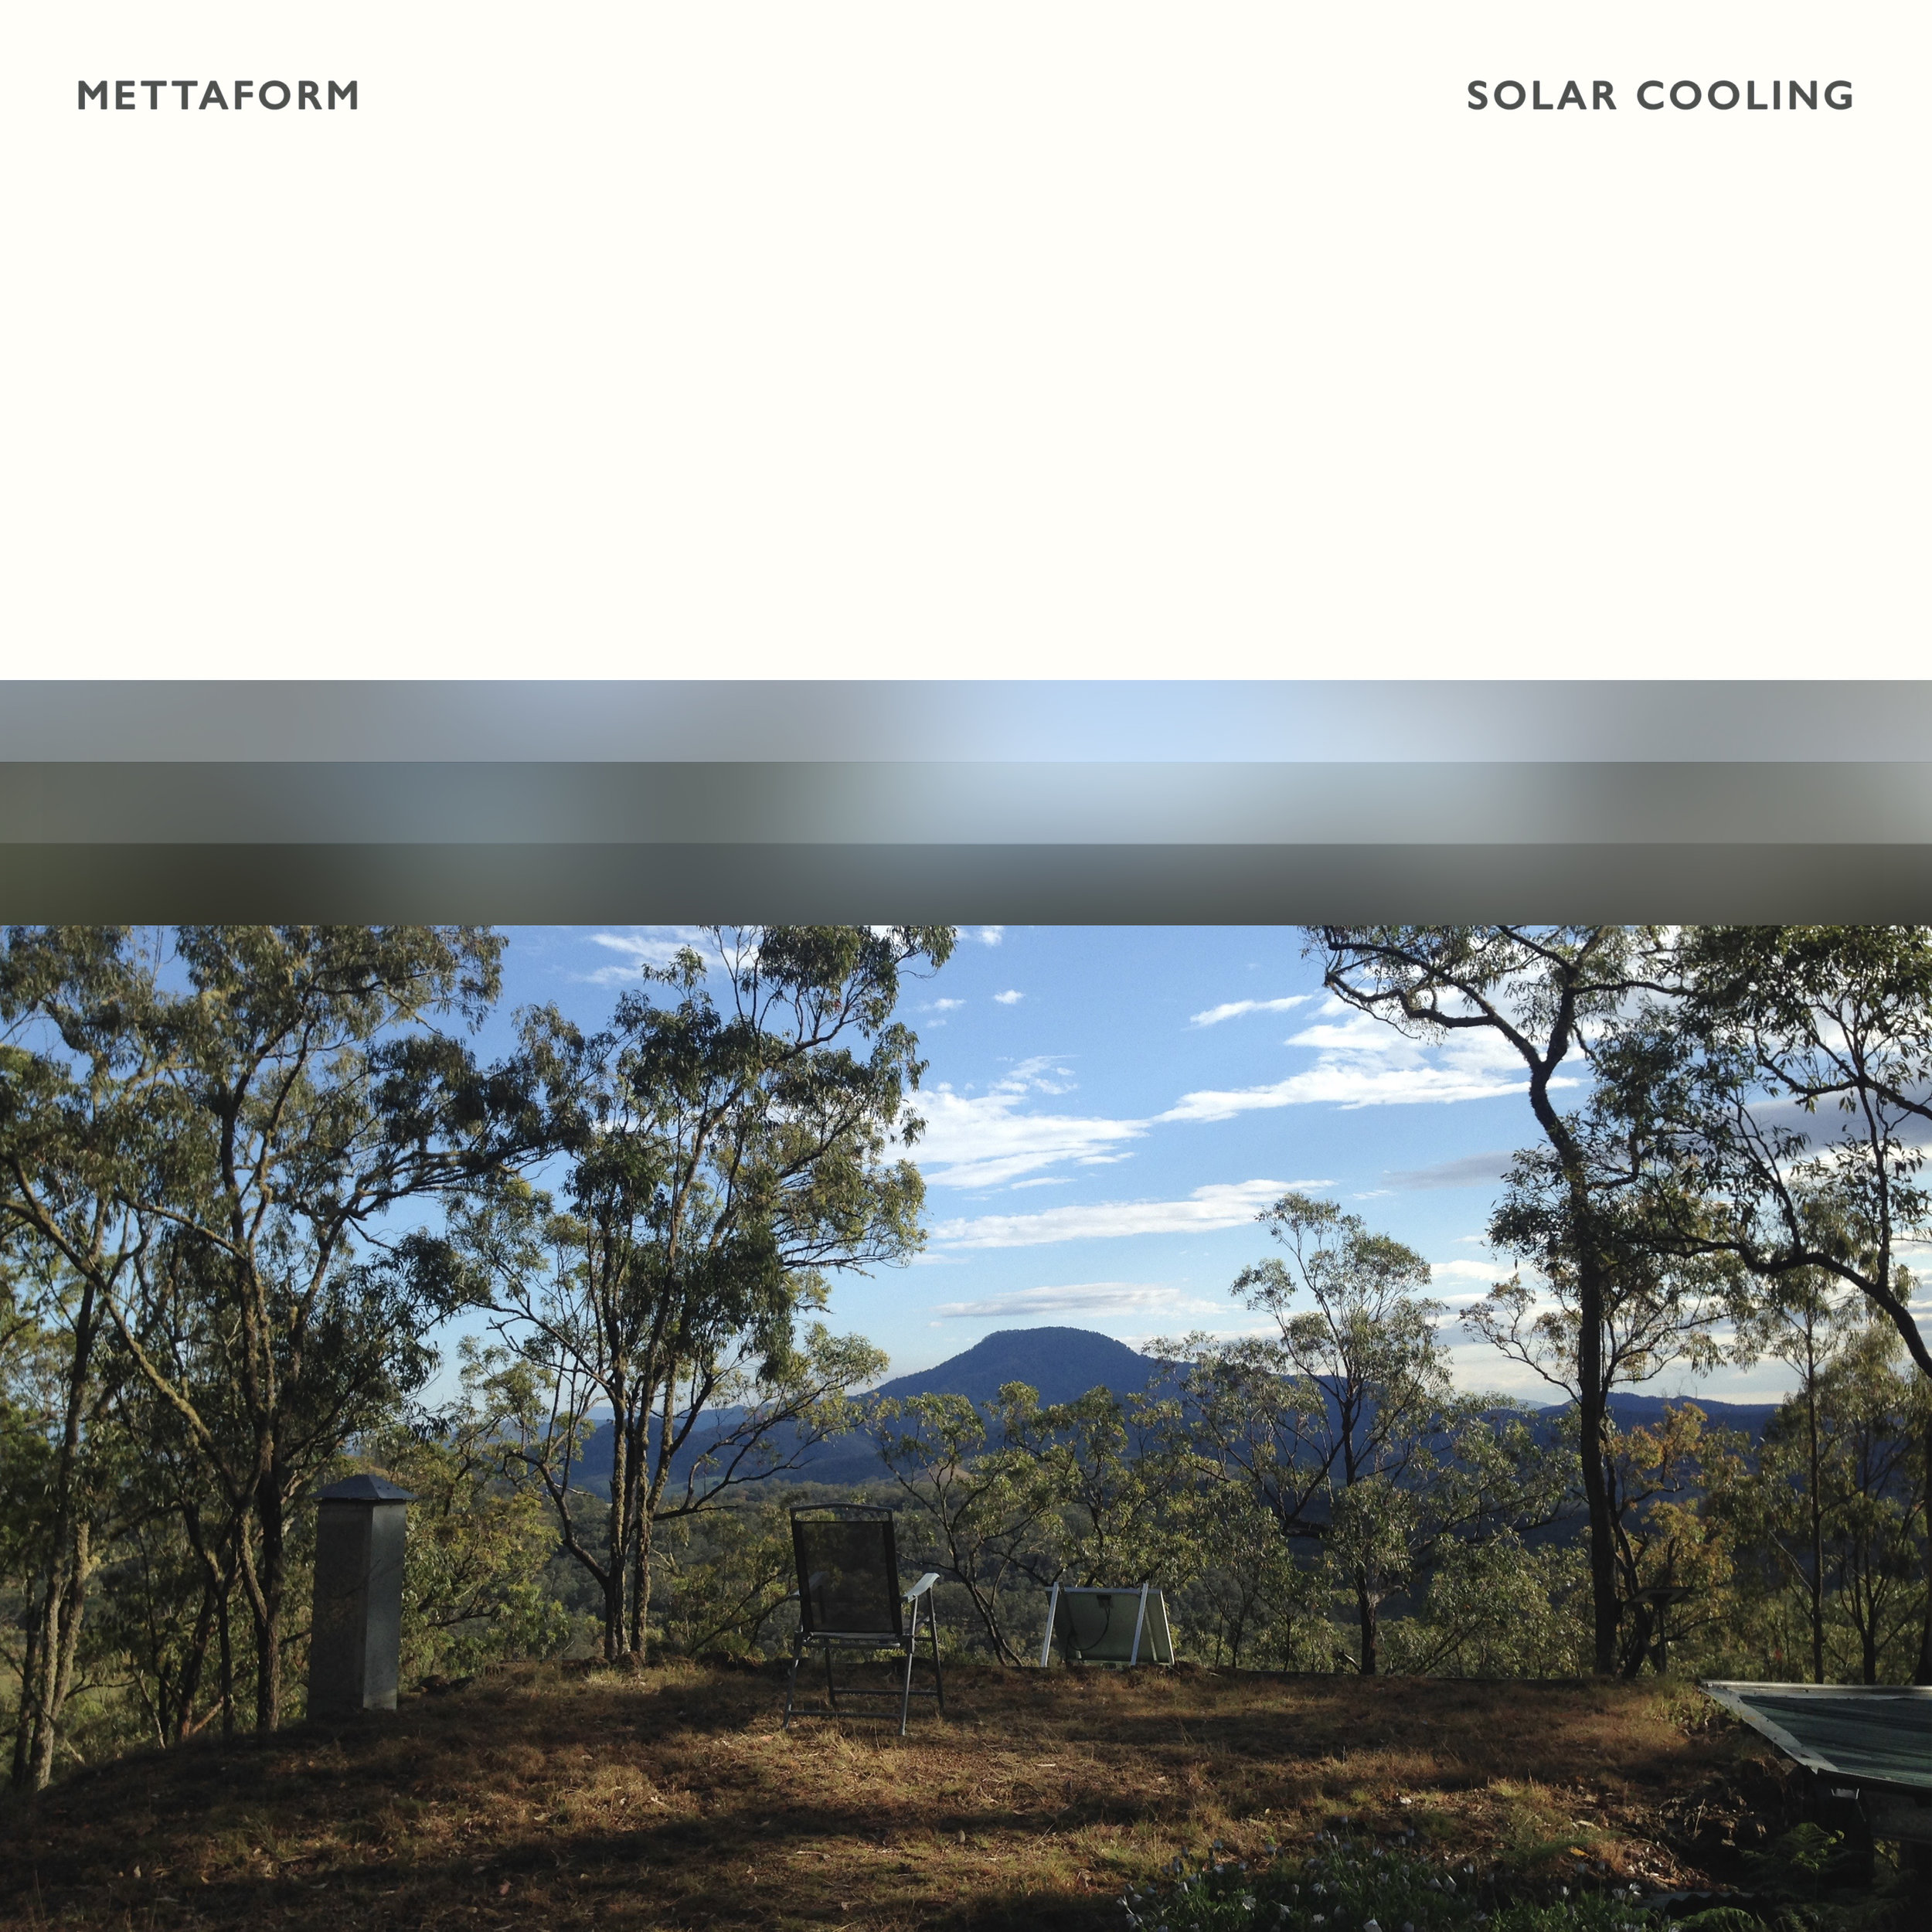 MettaForm - Solar Cooling